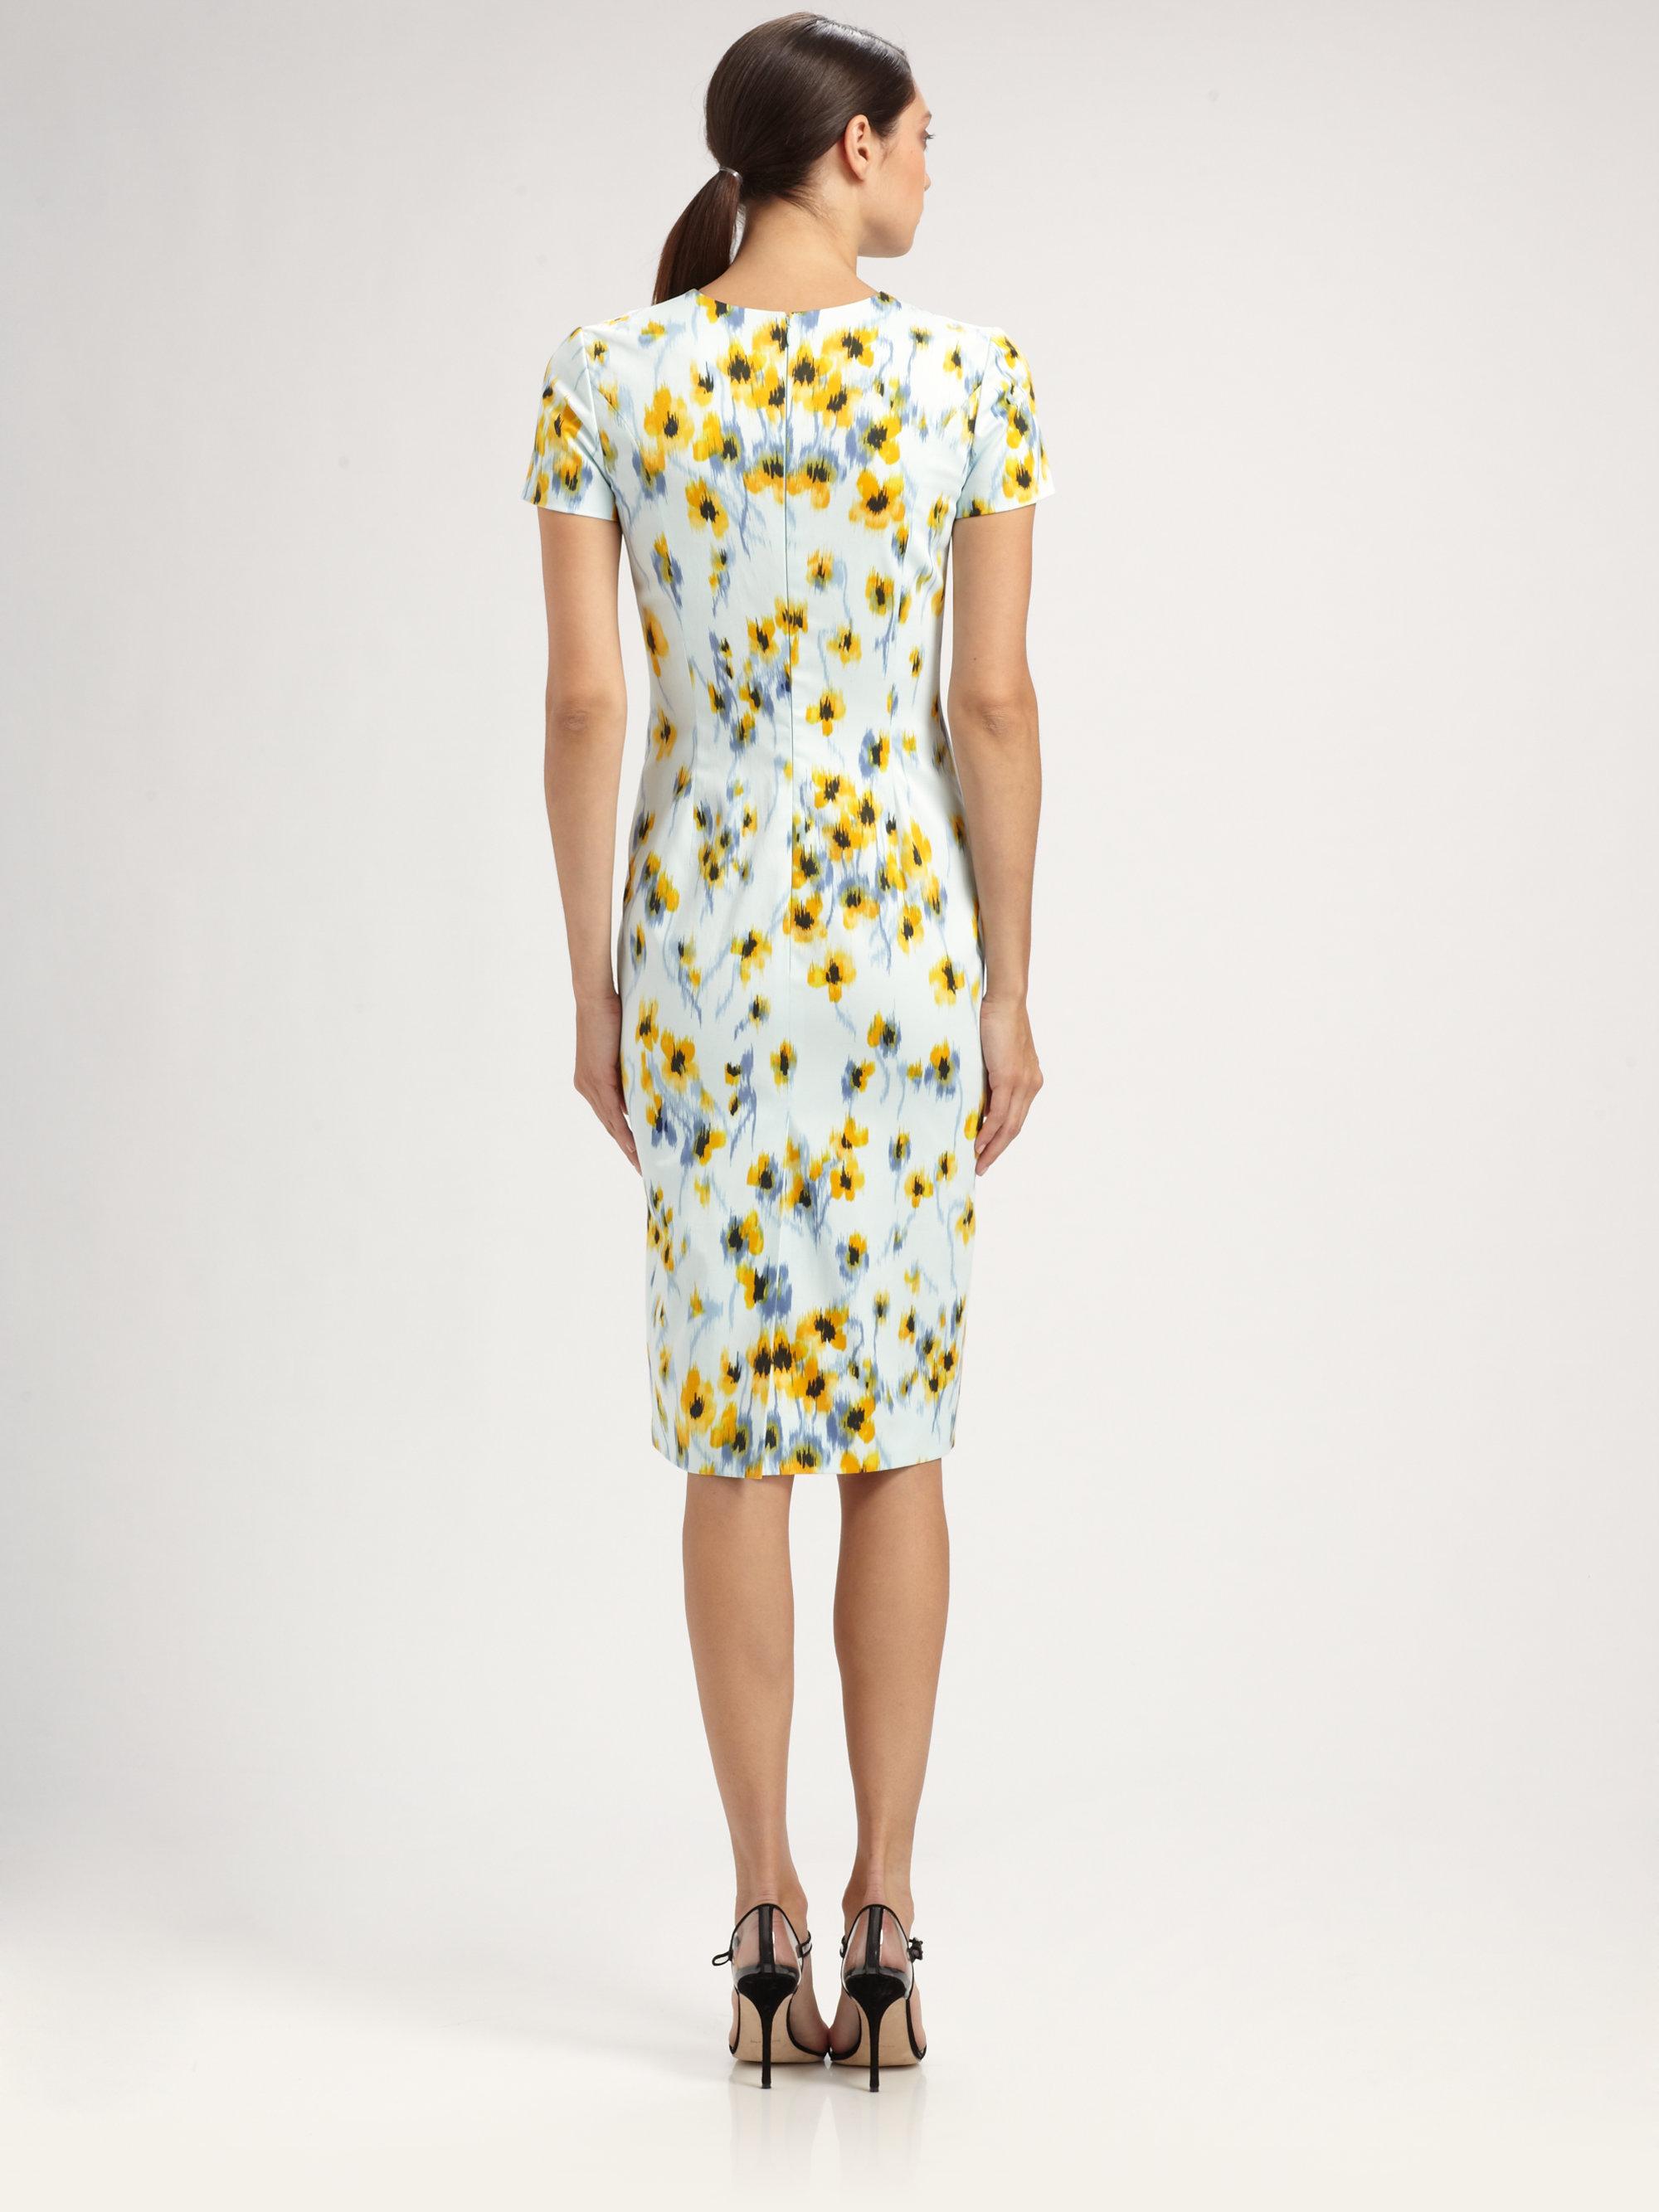 Lyst Carolina Herrera Floral Dress In Blue